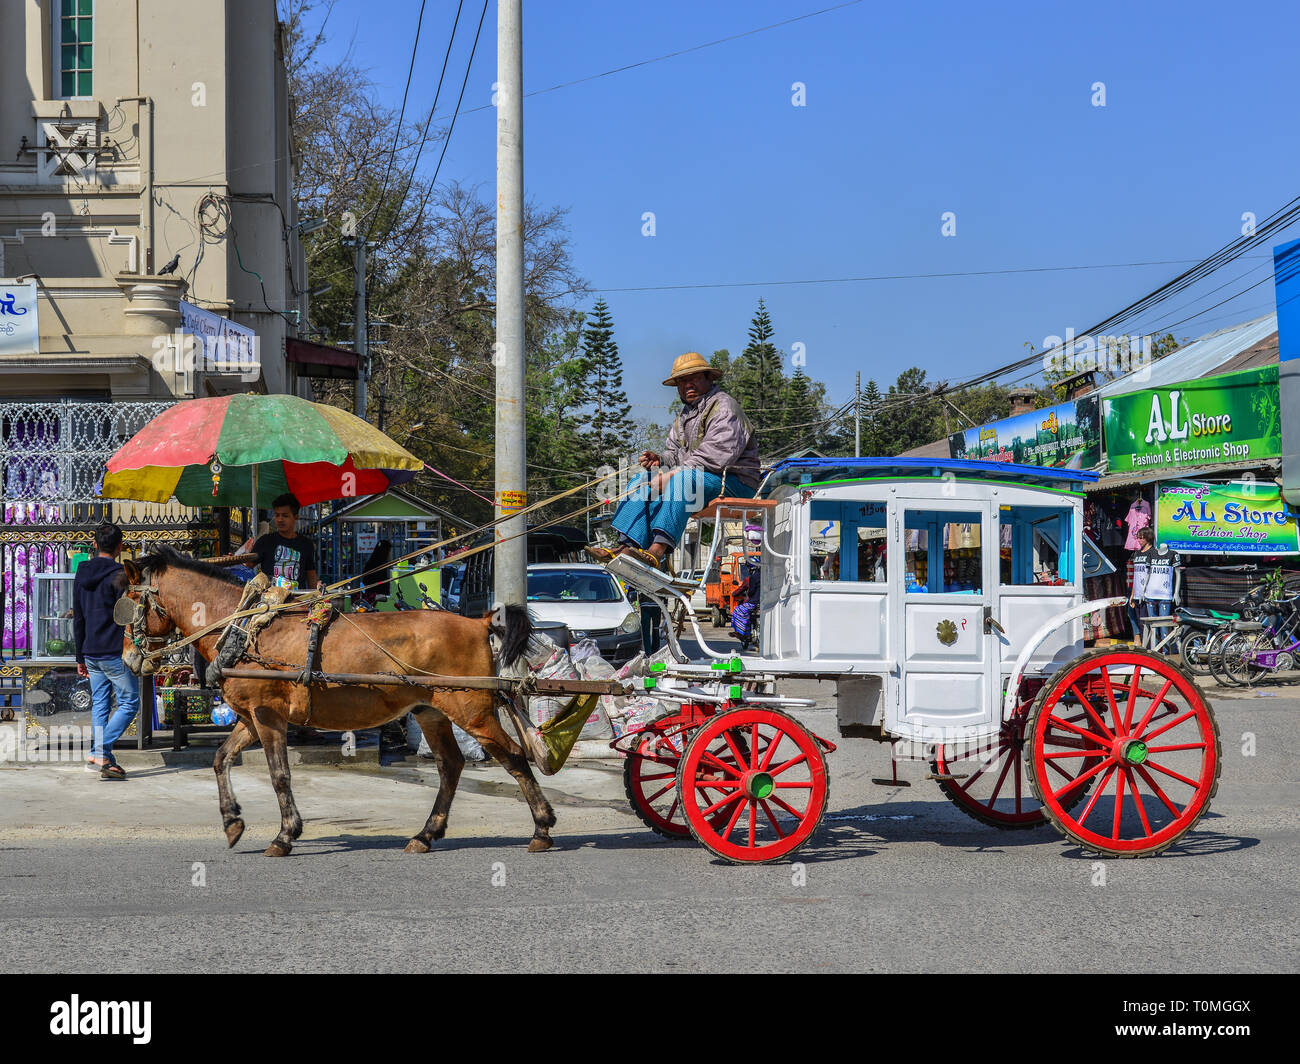 Pyin Oo Lwin, Myanmar - Feb 12, 2017  Horse carts in Pyin Oo